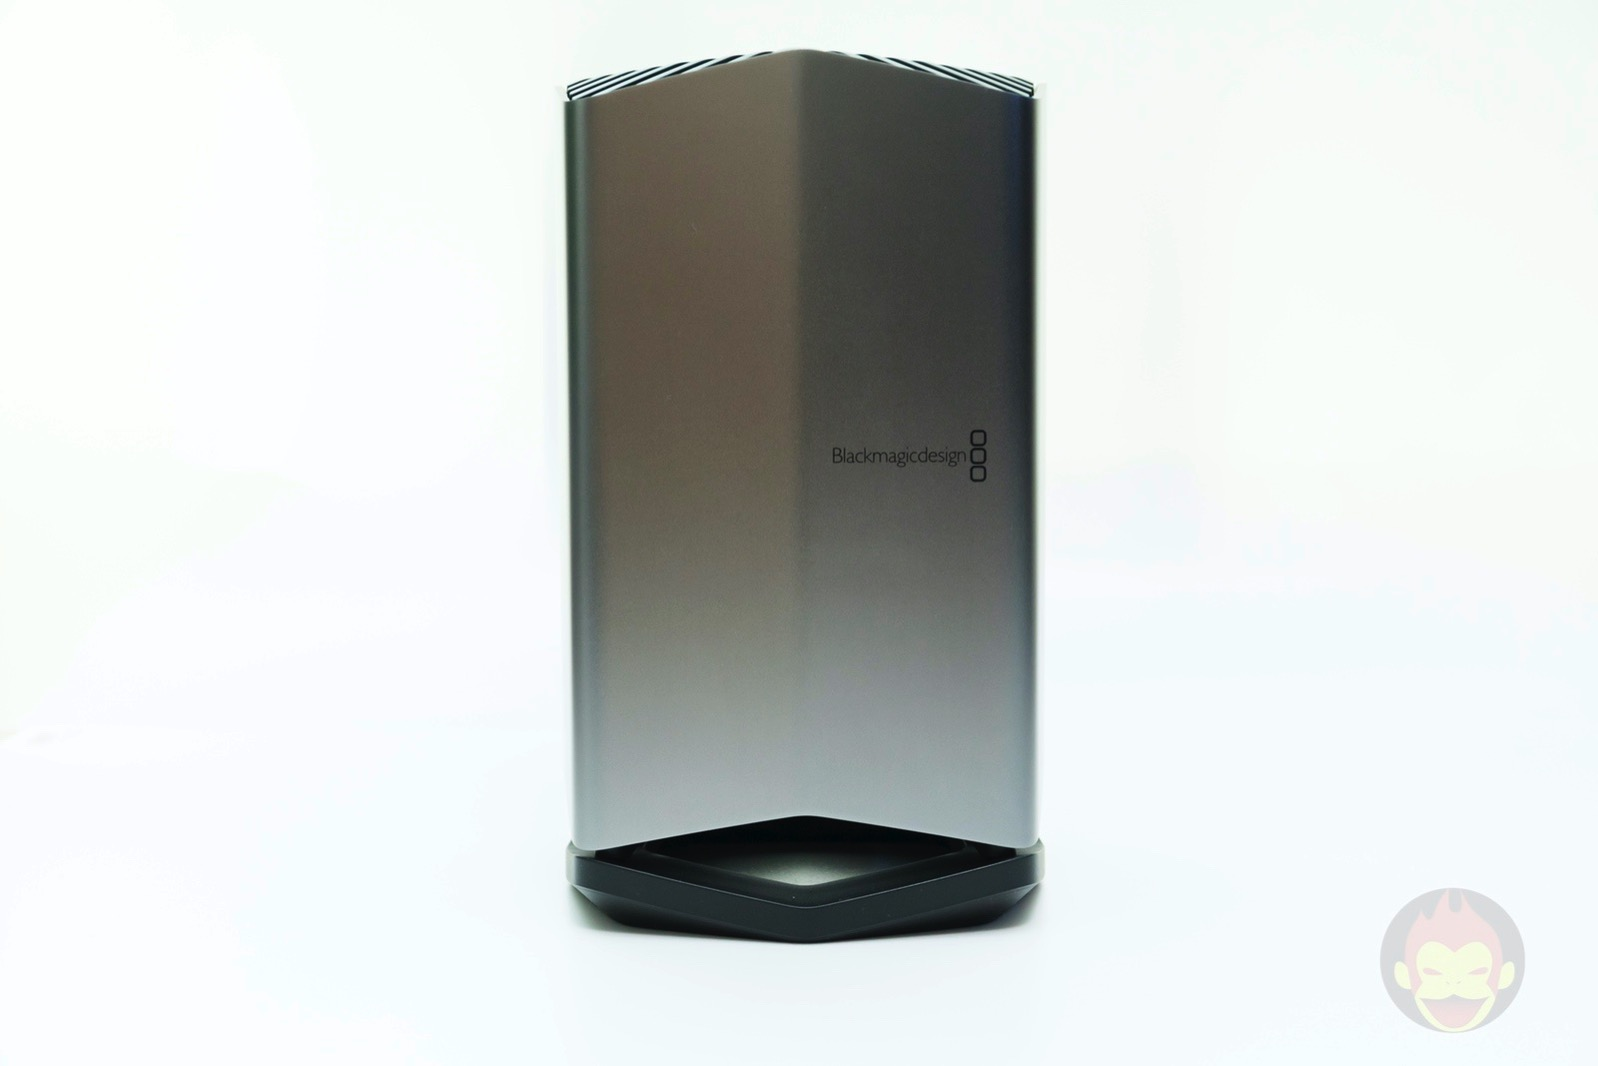 Blackmagic-eGPU-Review-01.jpg